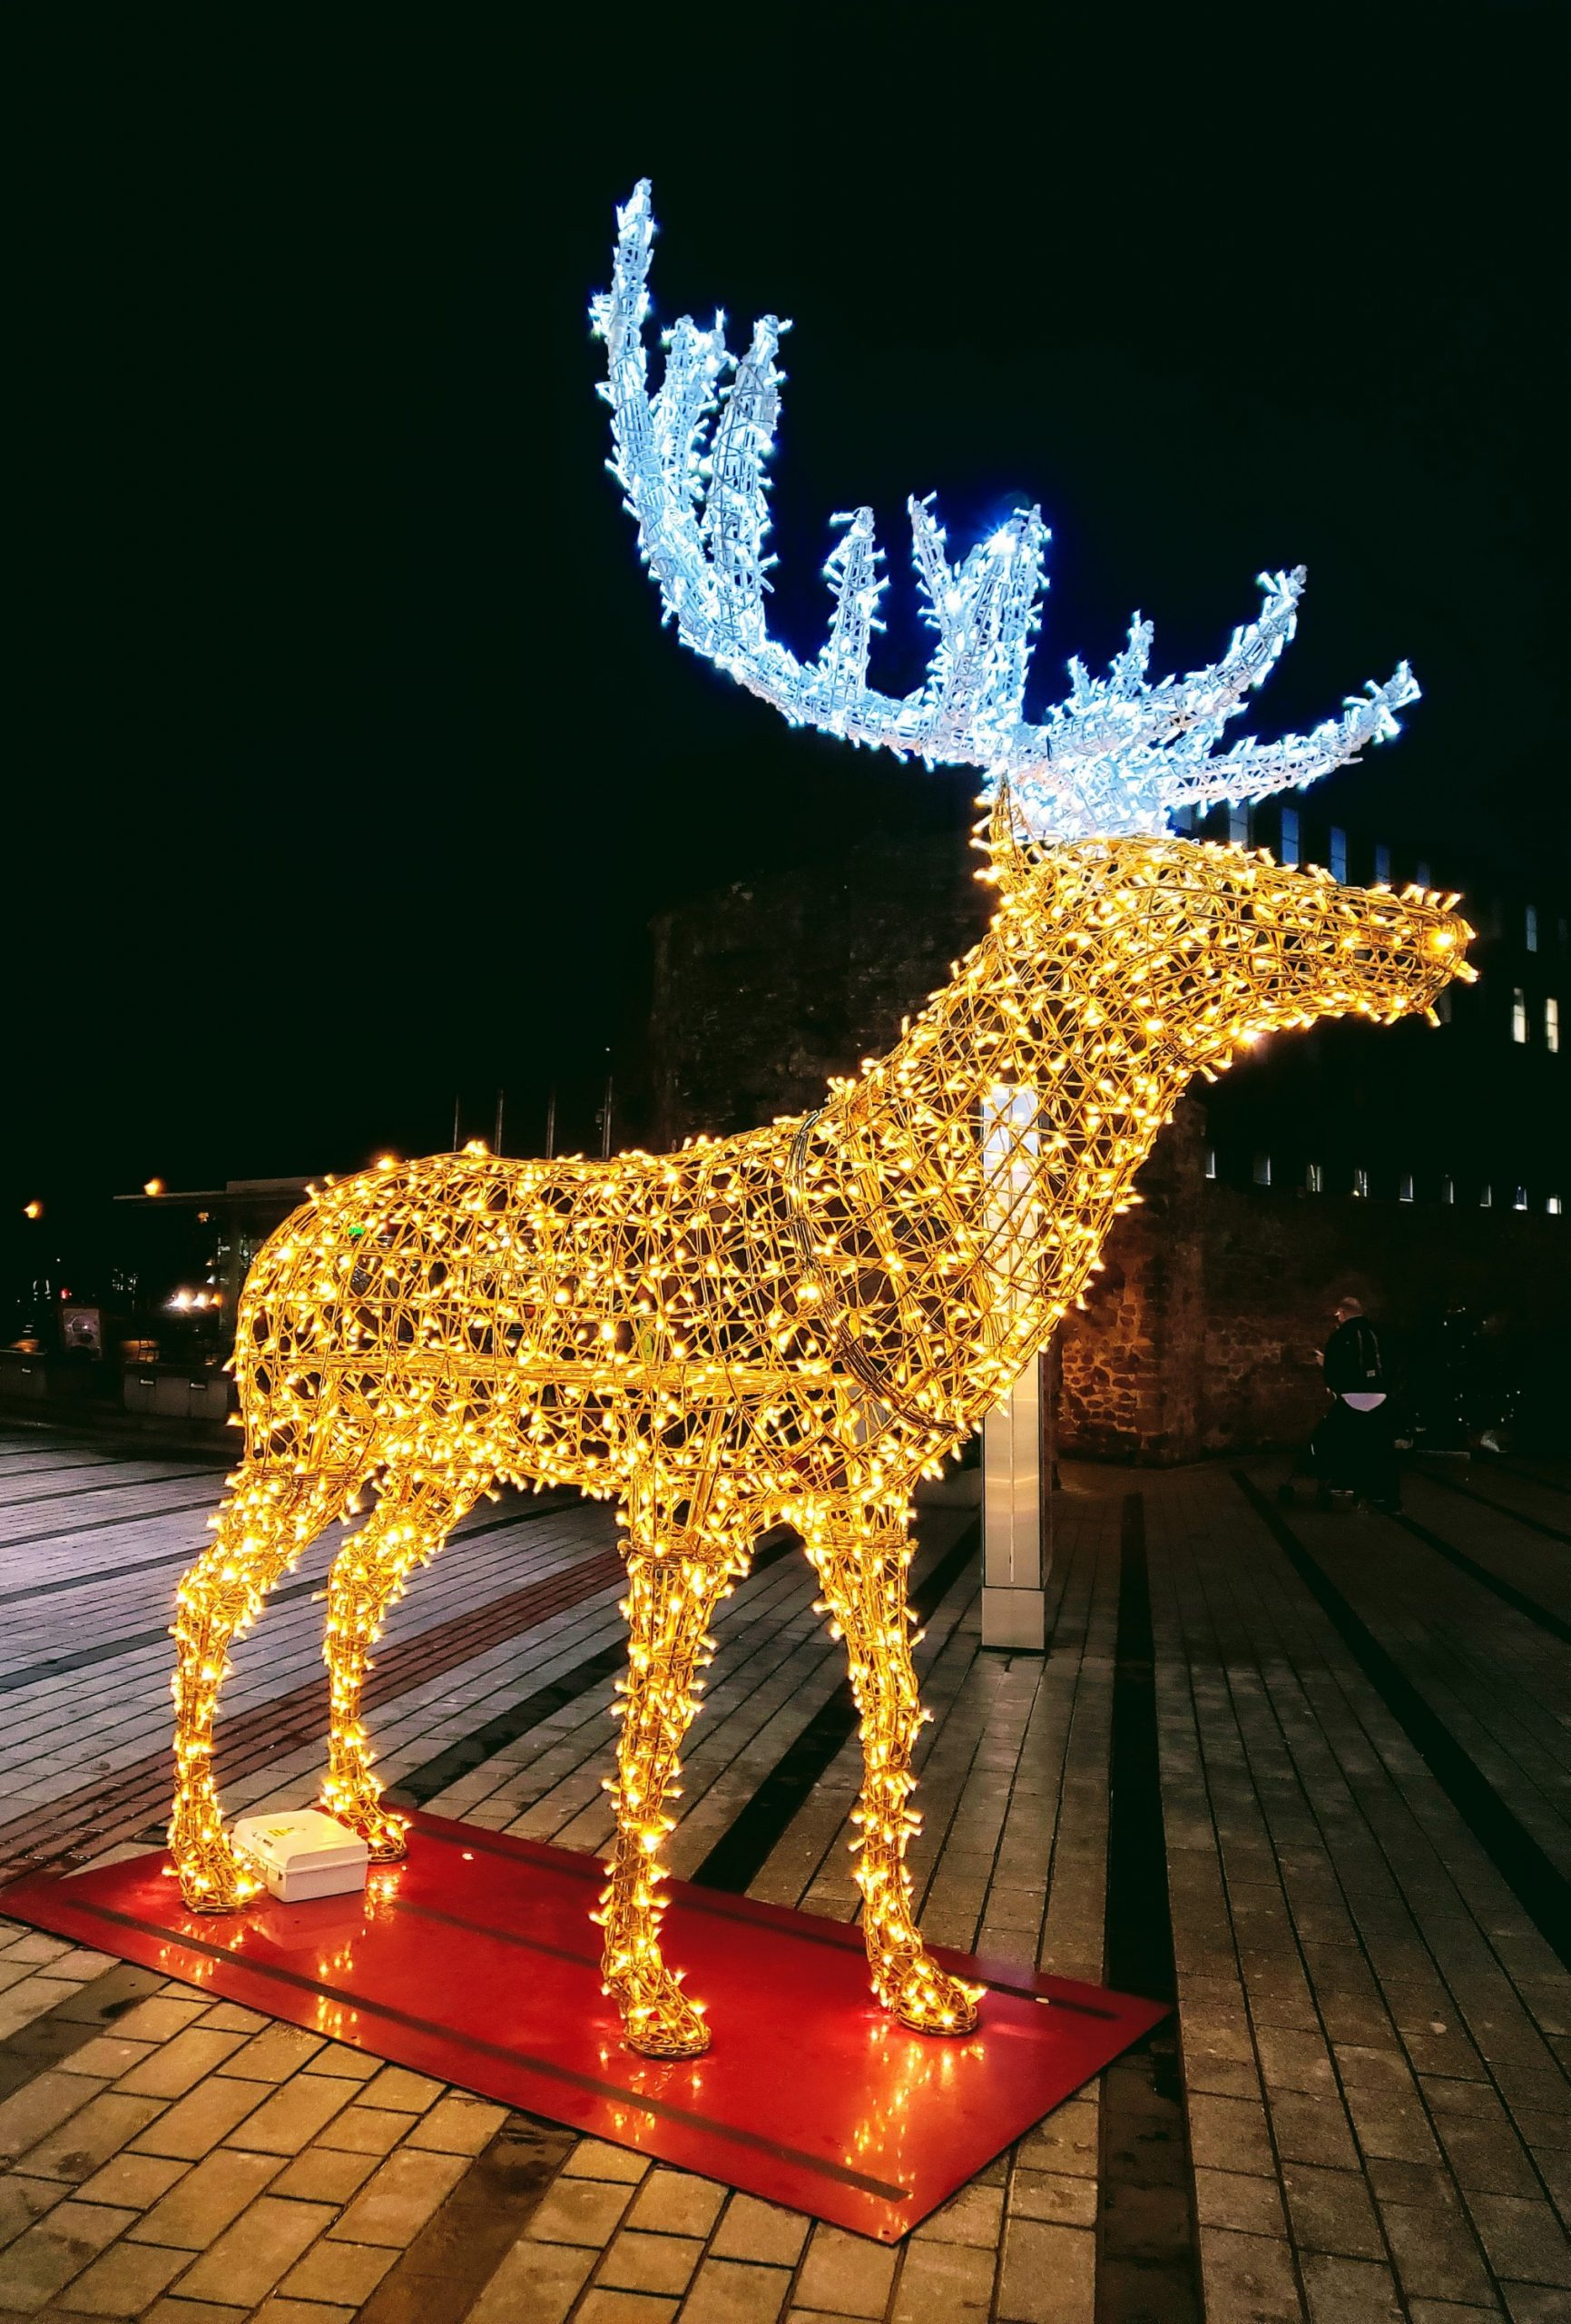 Lighted Christmas Reindeer Decoration